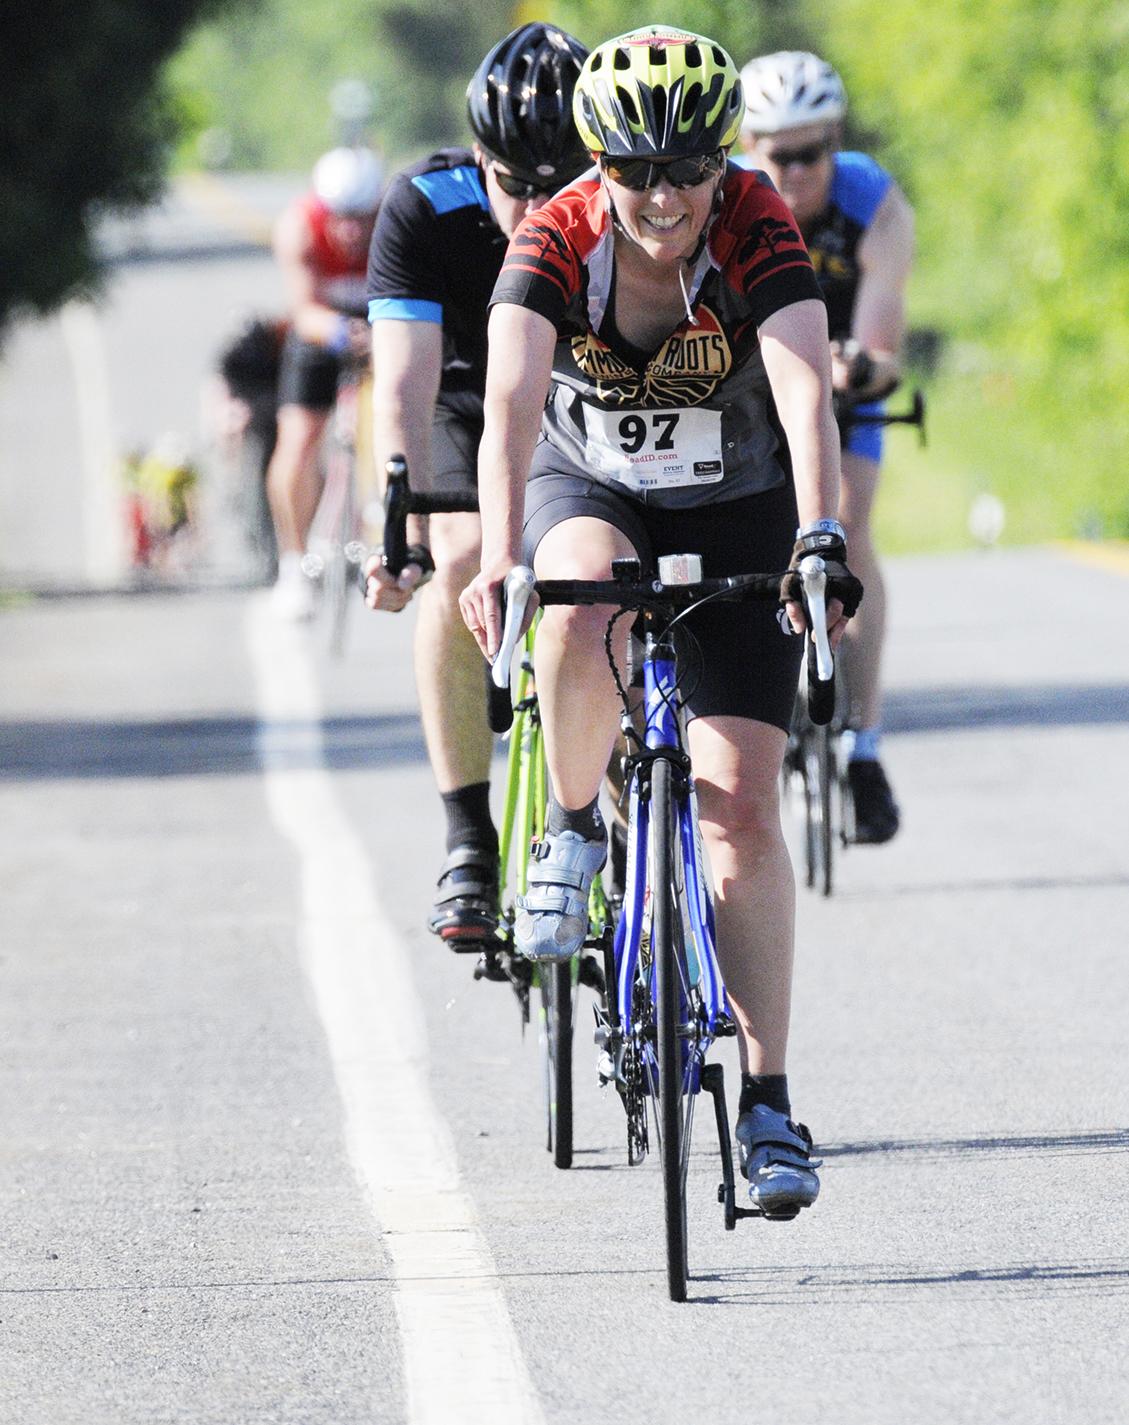 Riders competing at the 2017 Saratoga Lions Duathlon.   Barry Koblenz/ basetwelvephoto.com